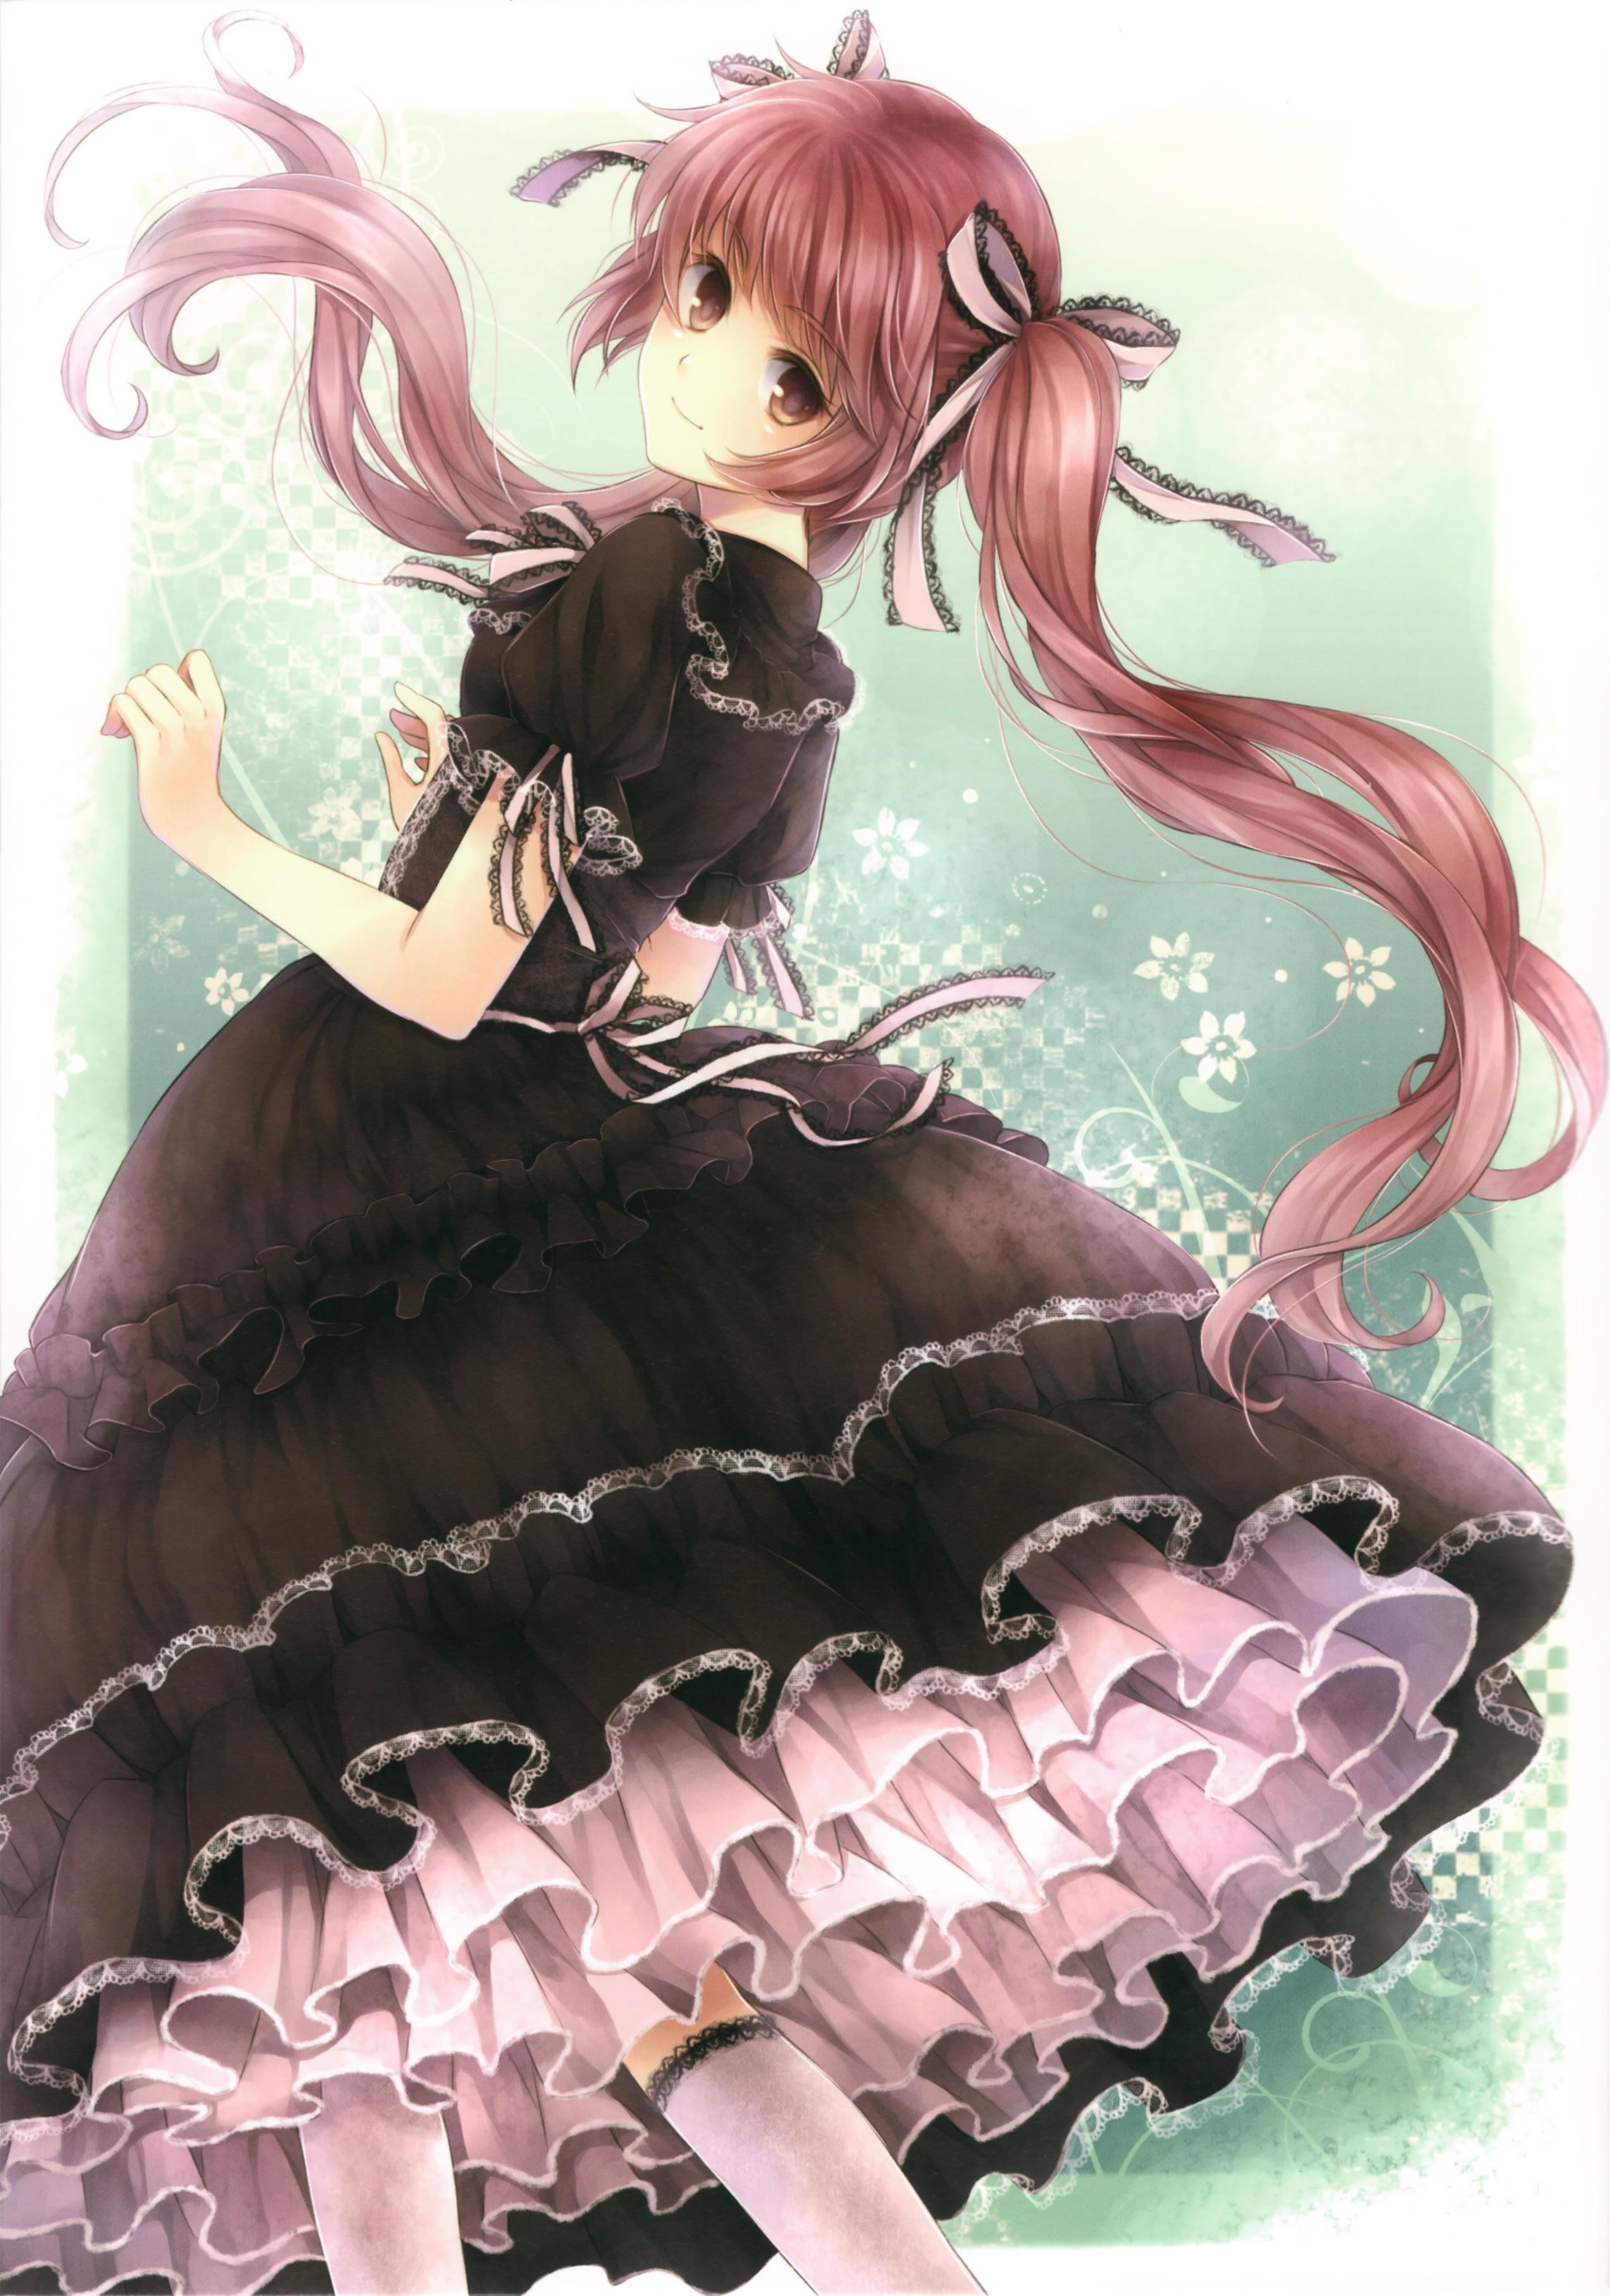 Girl Anime Dress